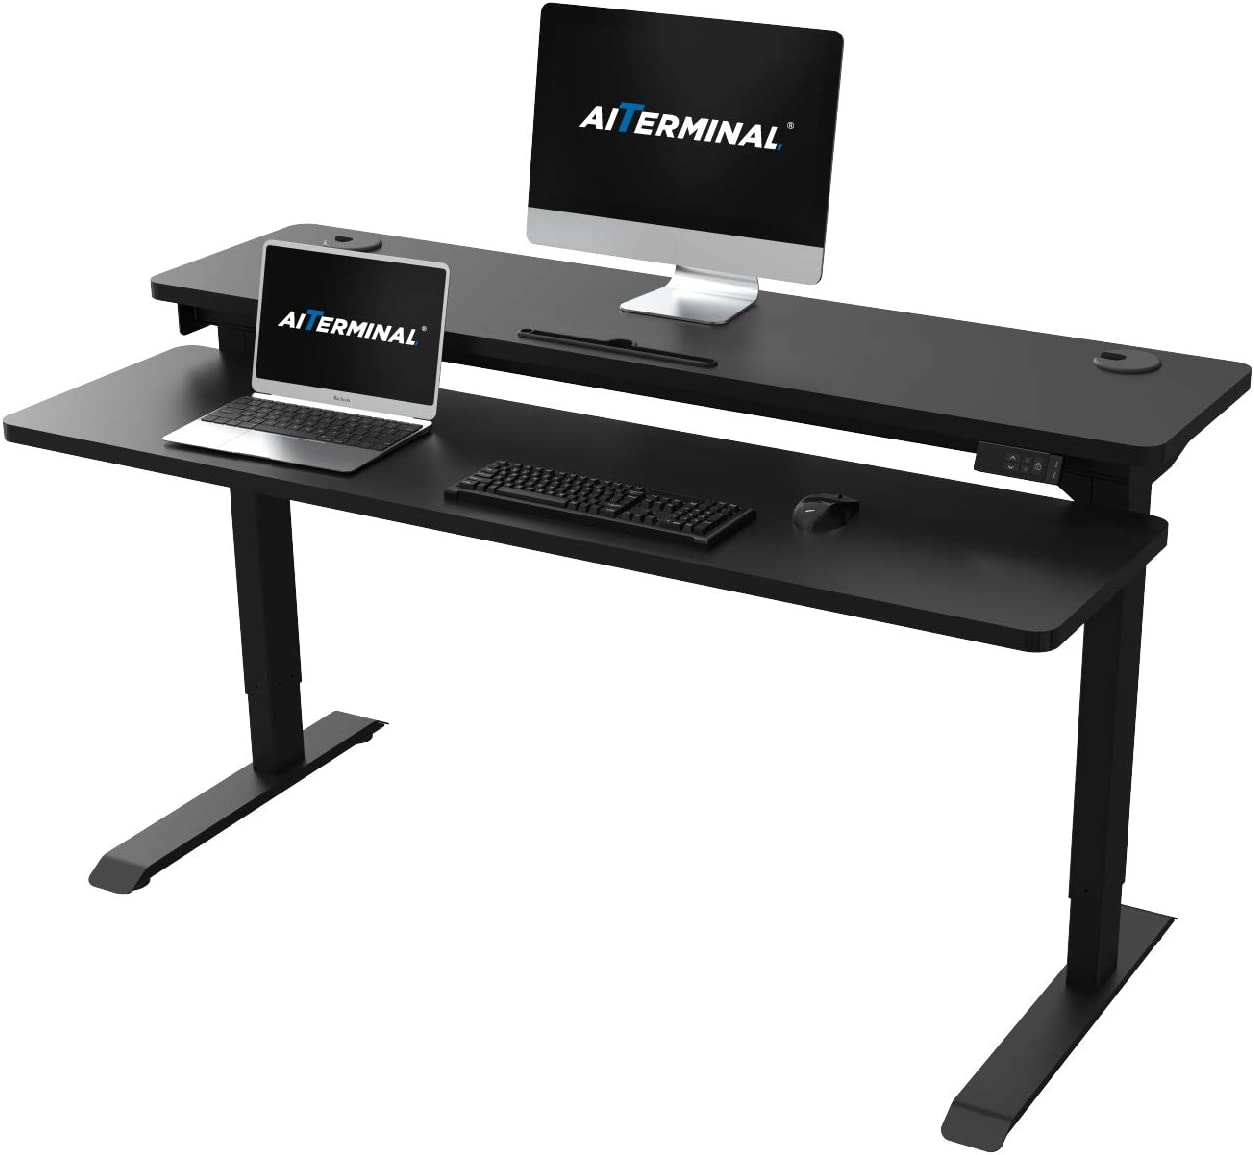 AITERMINAL Electric Stand Under blast sales Up Desk Adju 2 Dual Popular popular Tiers Motor-Height